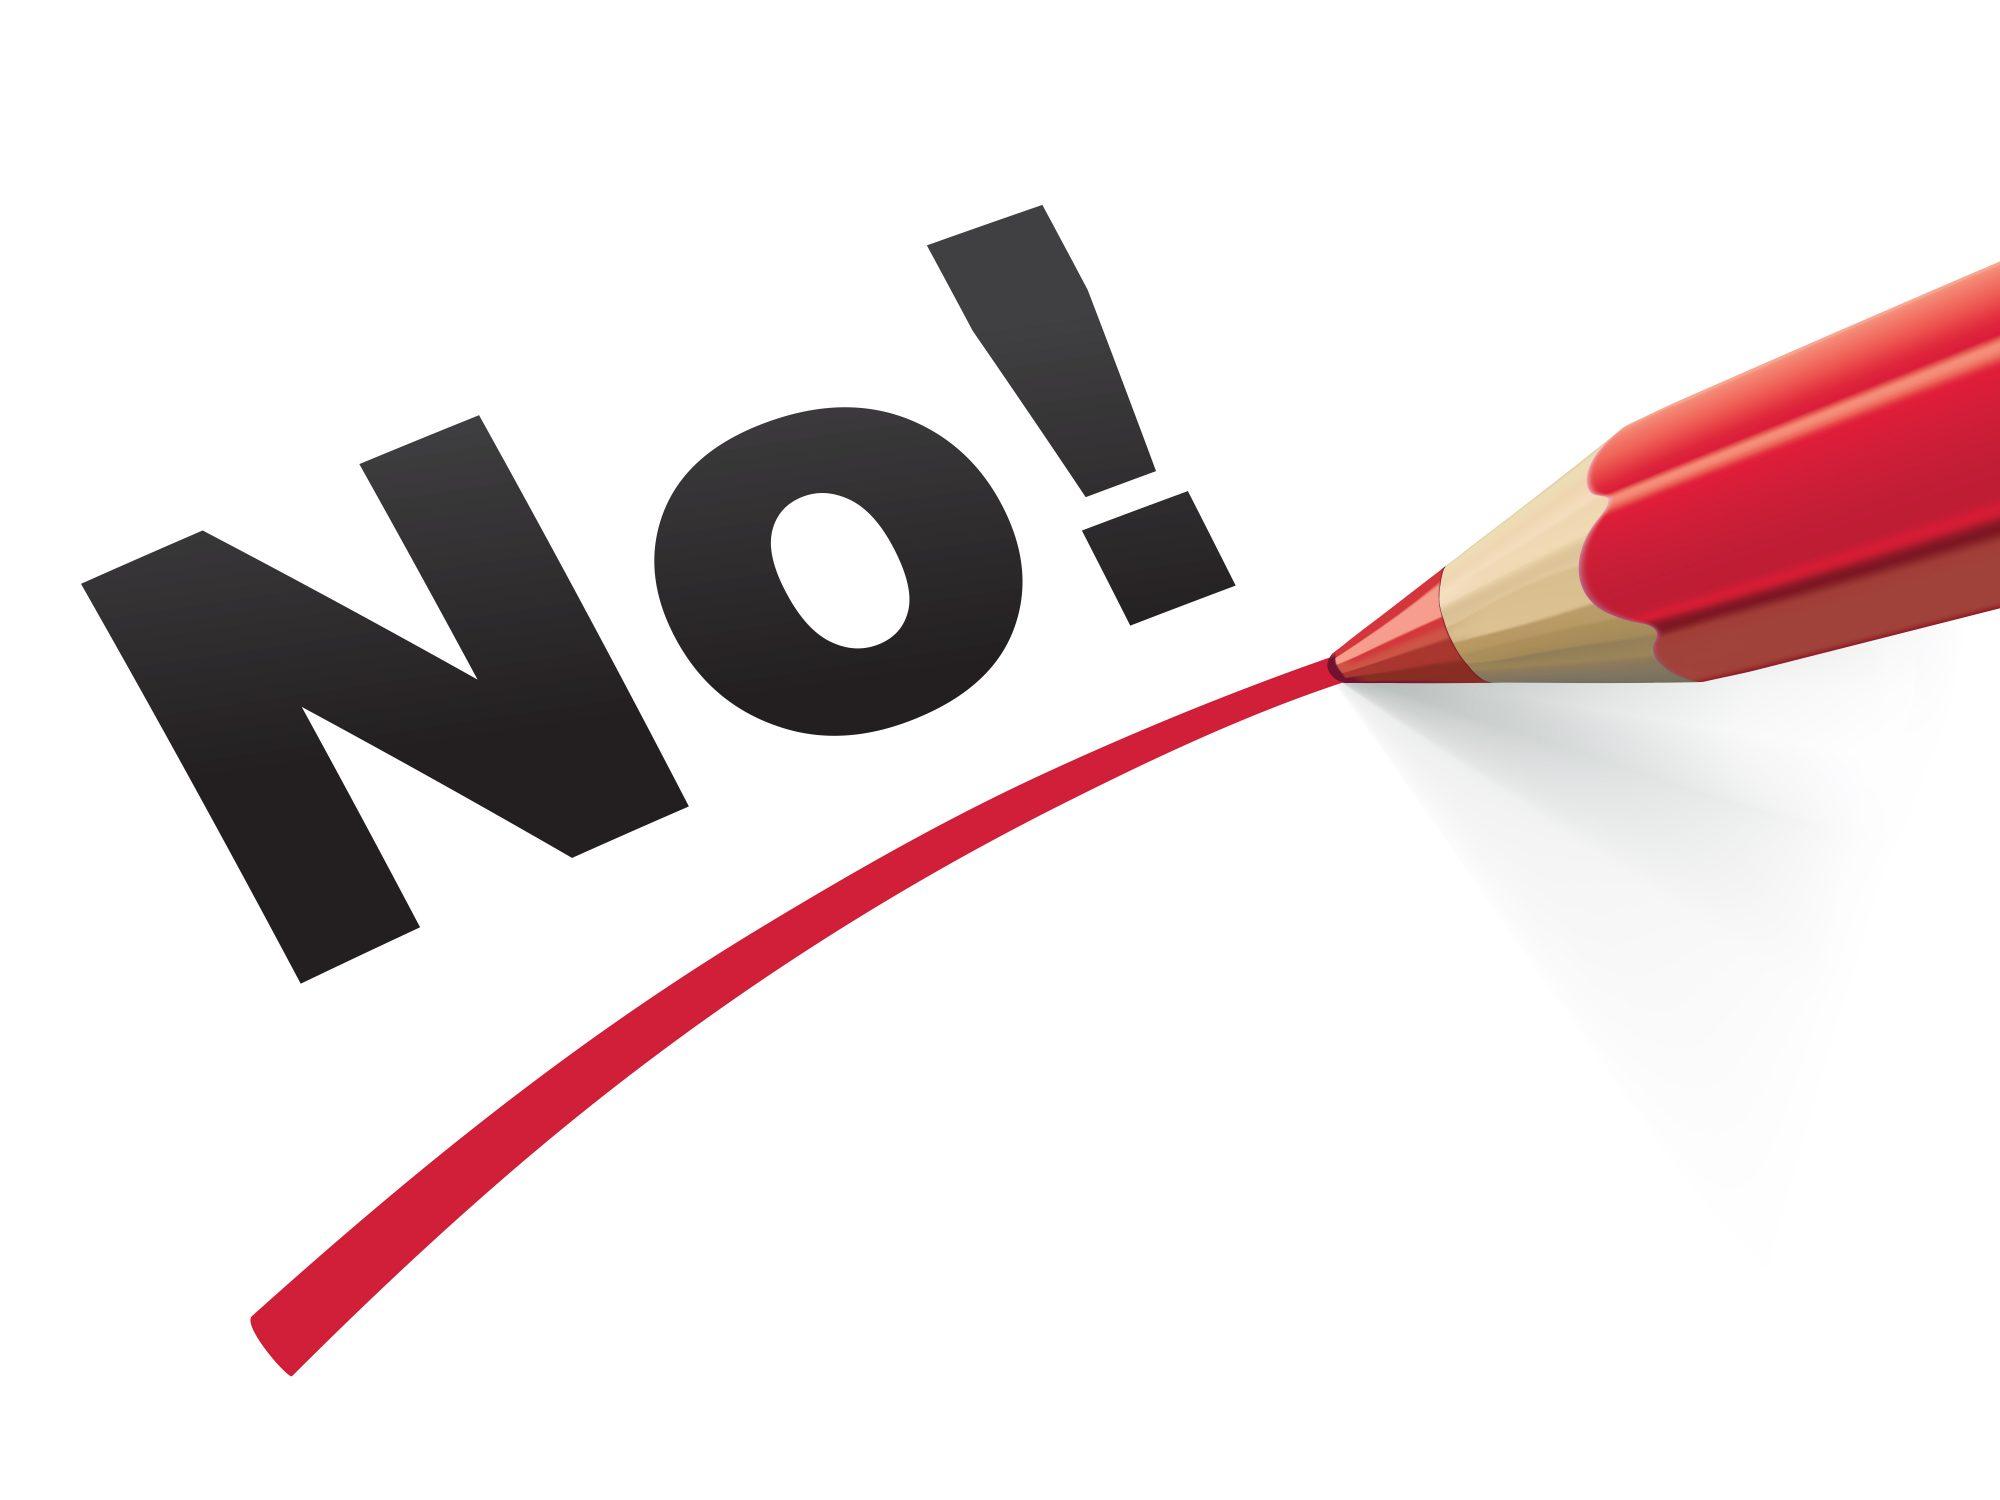 Pencil check No. Vector Illustration